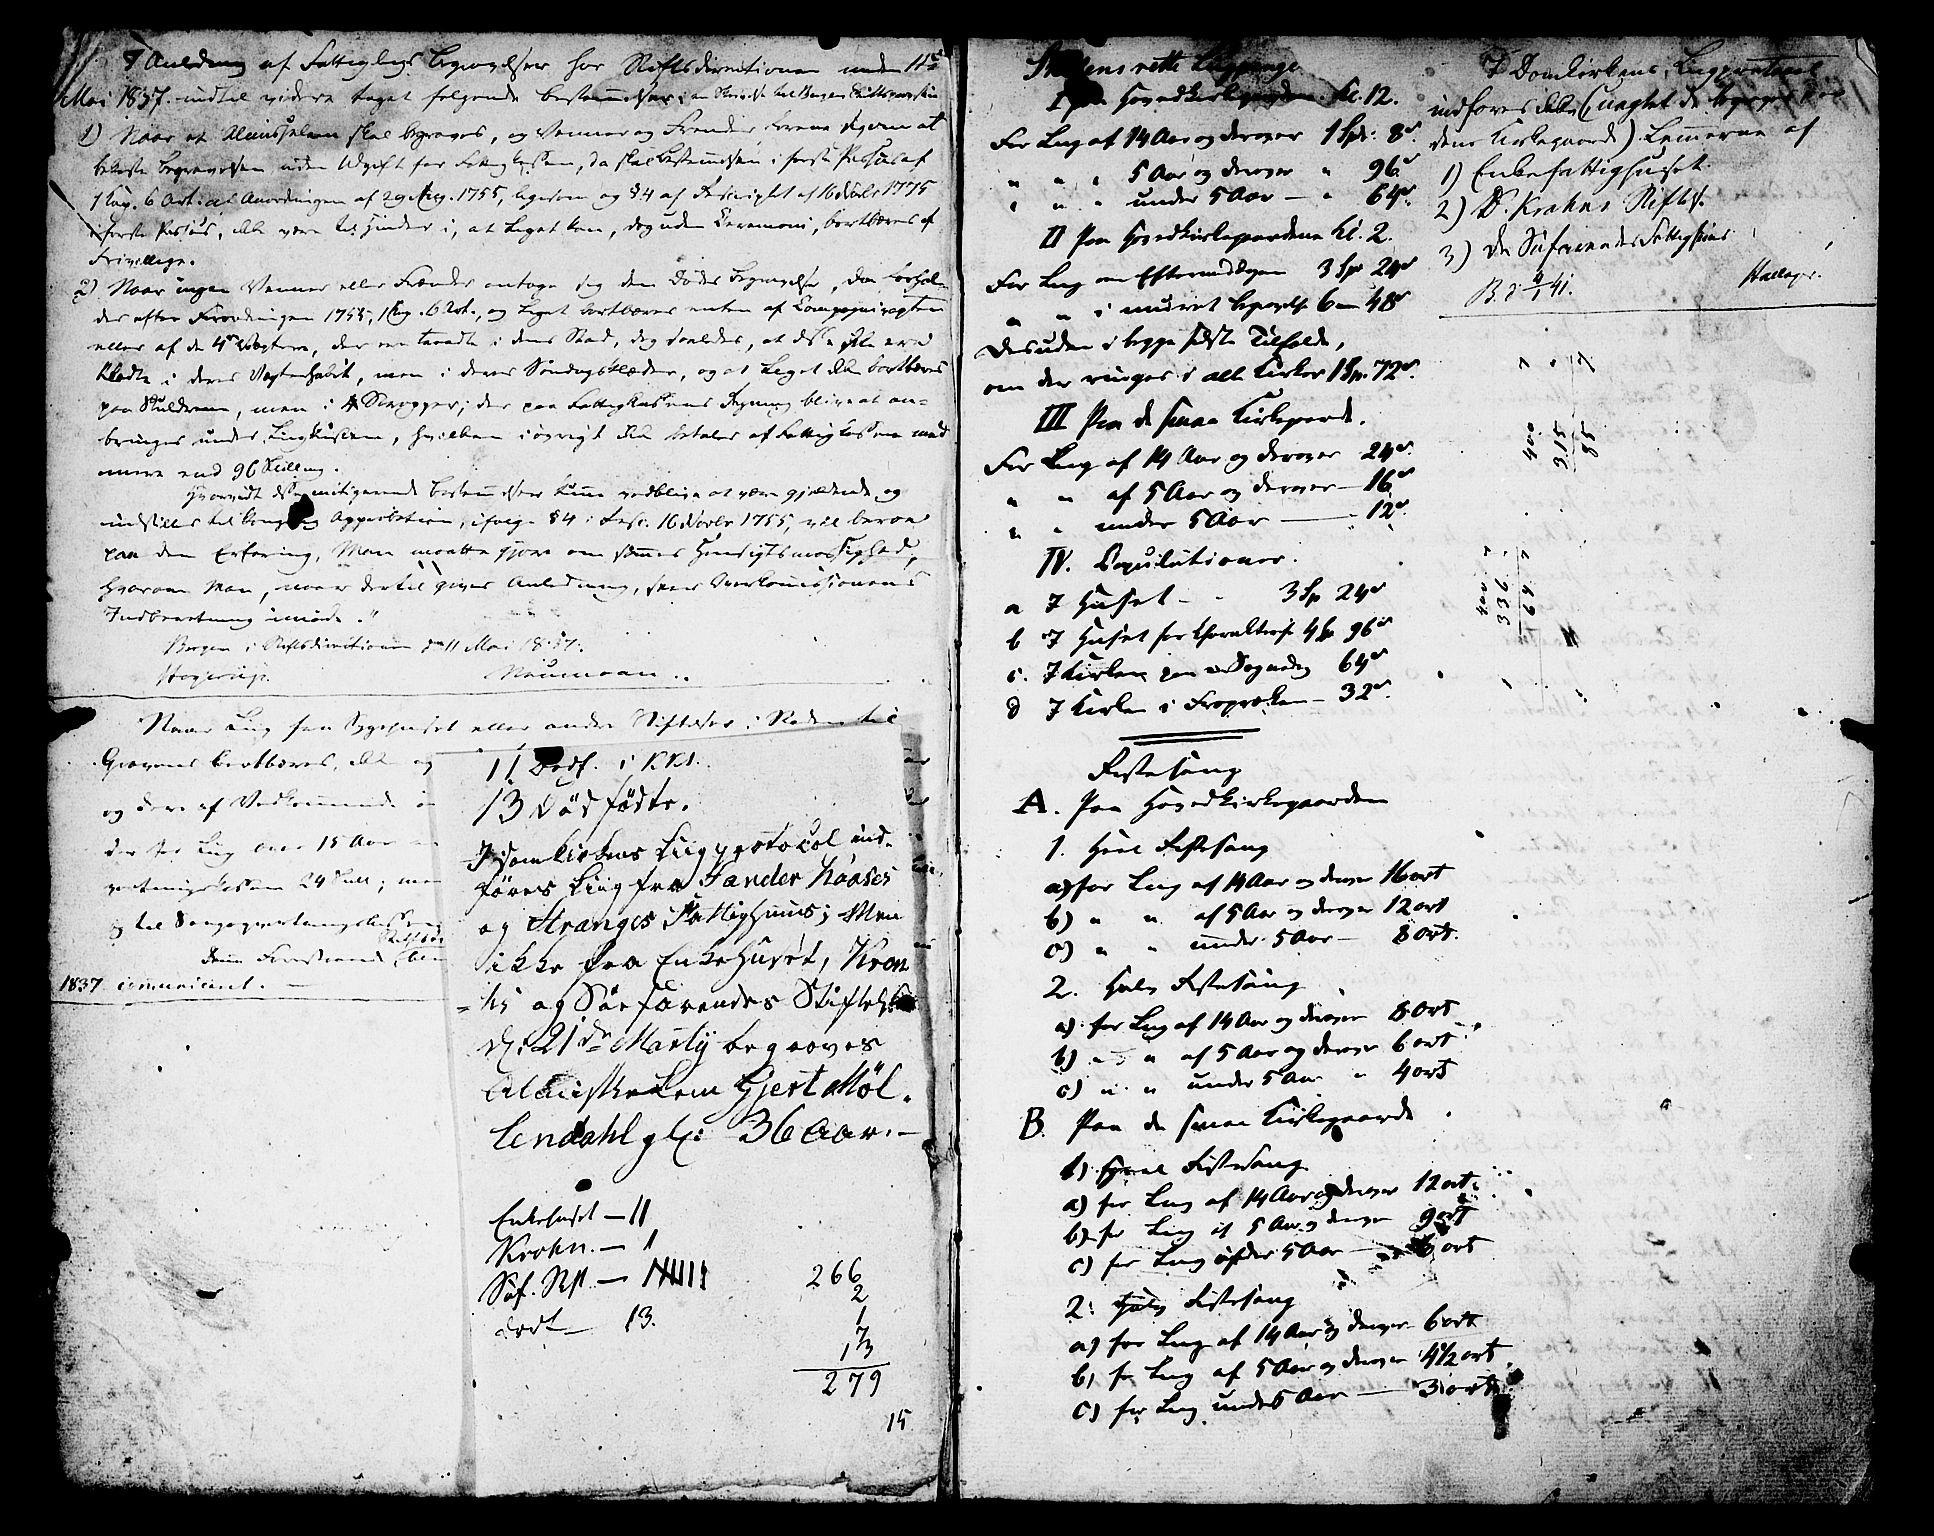 SAB, Domkirken Sokneprestembete, Annen kirkebok nr. I.4.H, 1834-1841